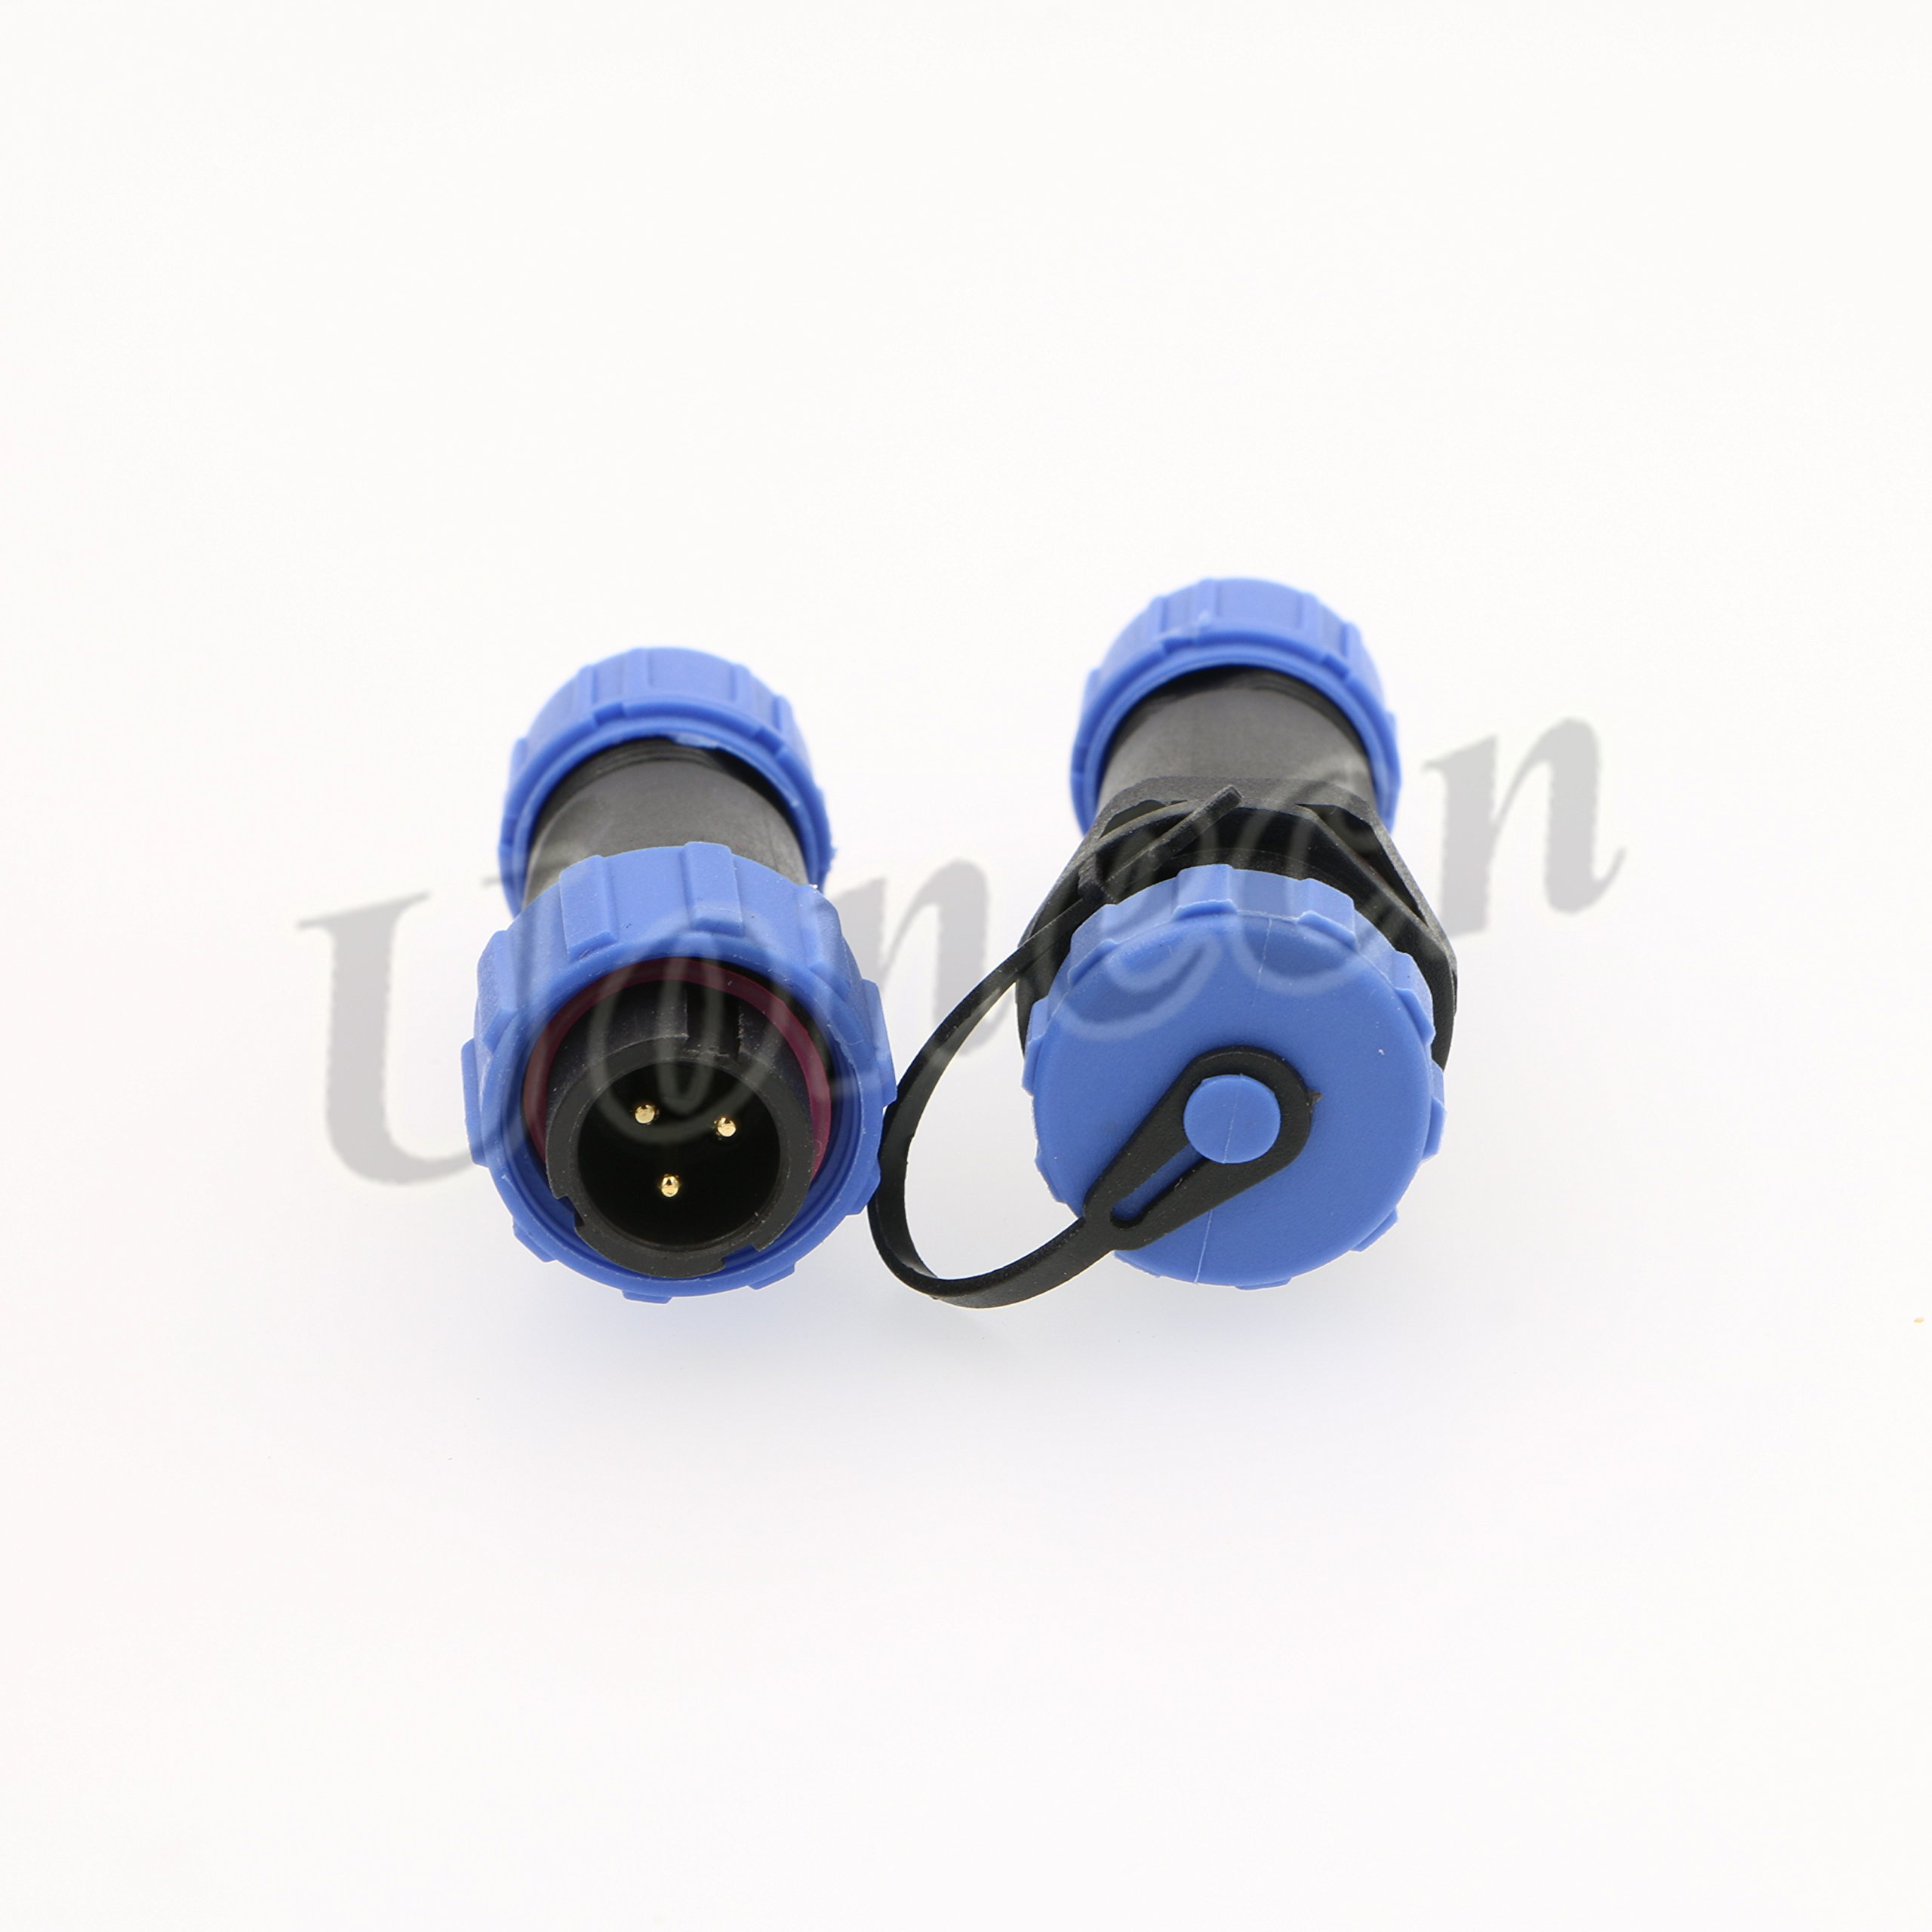 Uonecn SP13 IP68 Waterproof 3 Pin Power Plug Connector 5 pcs ircular Kit Male Plug Female Socket 3 Pin LED High Power Connectors